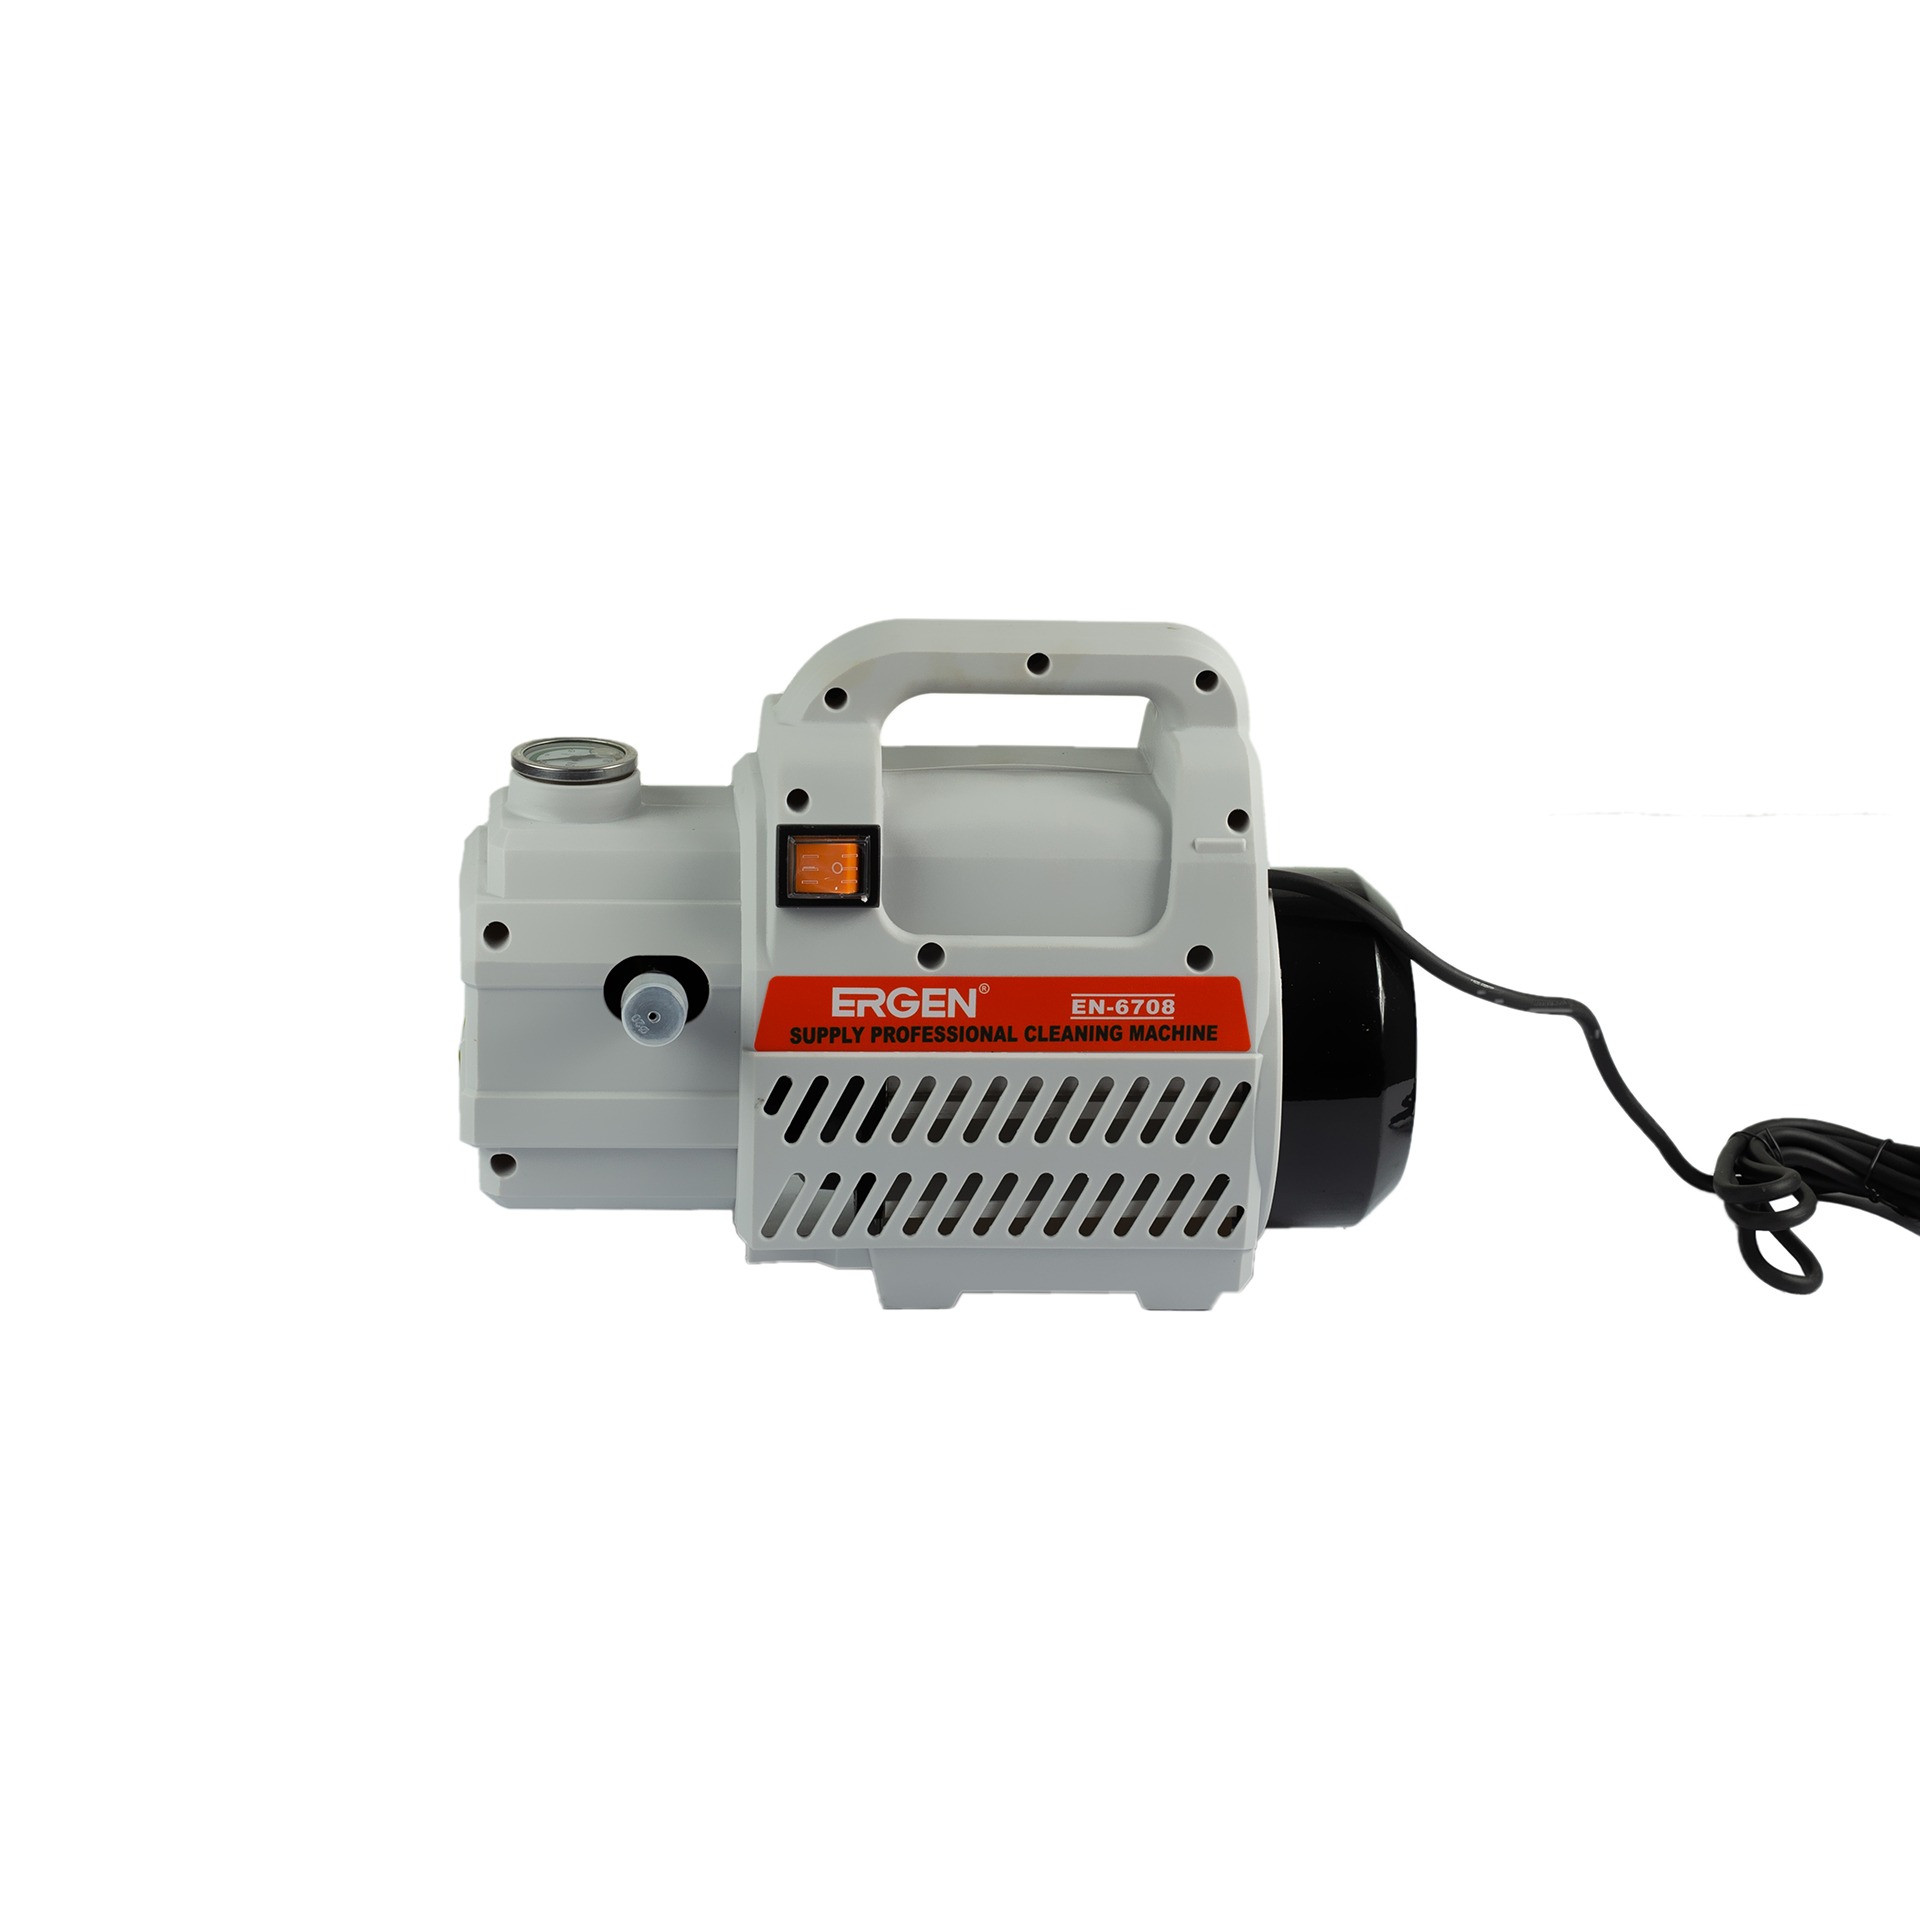 Máy bơm xịt rửa xe áp lực cao EN-6708 máy bơm xịt rửa xe áp lực cao mini +Tặng tua vit 2 đầu + móc khóa kĩ thuật